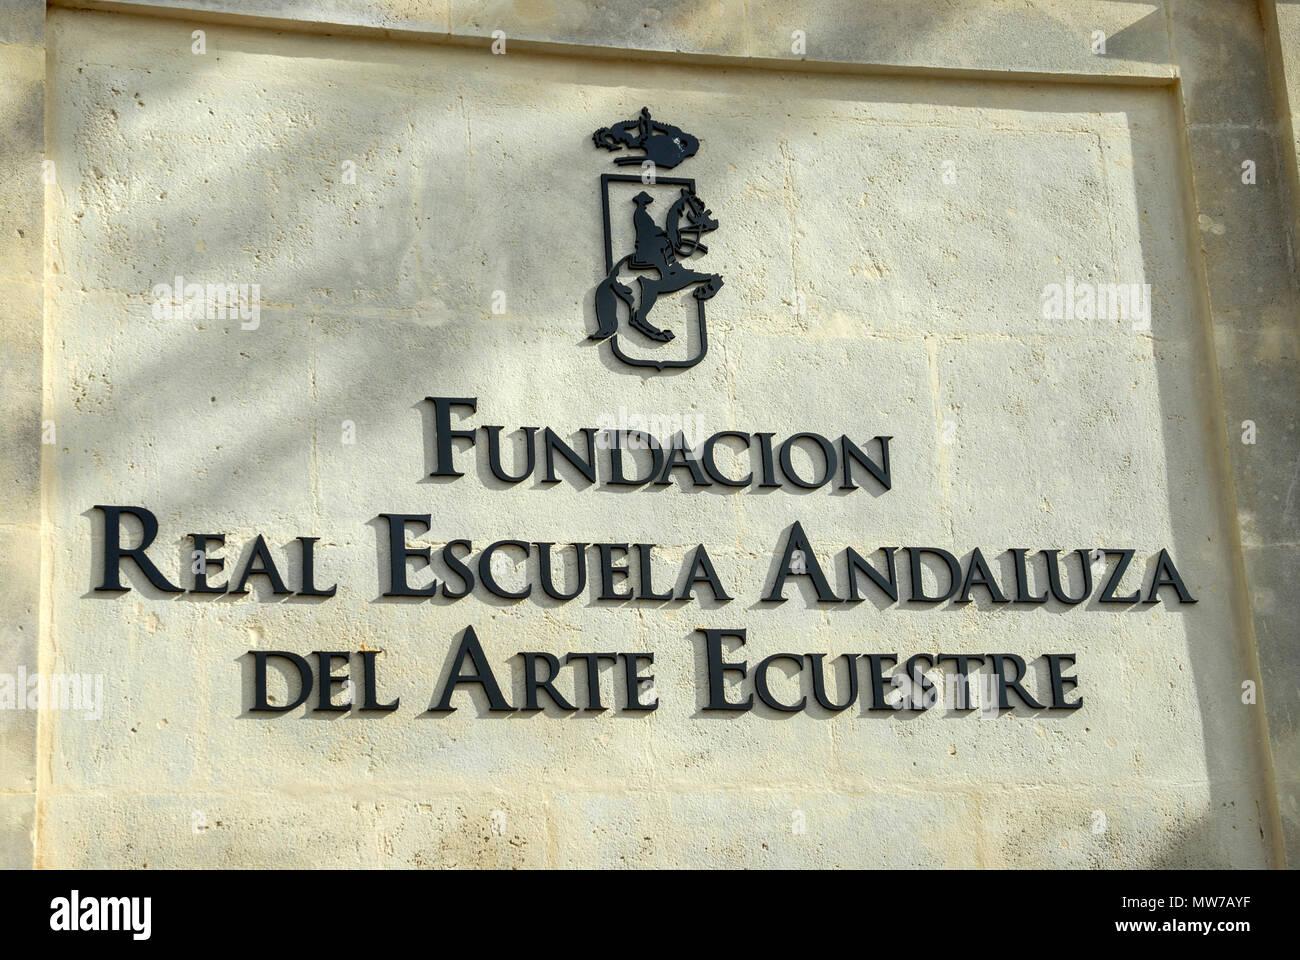 The main gated entrance to the famed Real Escuela Andaluza de Arte Equestre - the Royal Andalucian School of Equestrian Art in Jerez de la Frontera, c - Stock Image